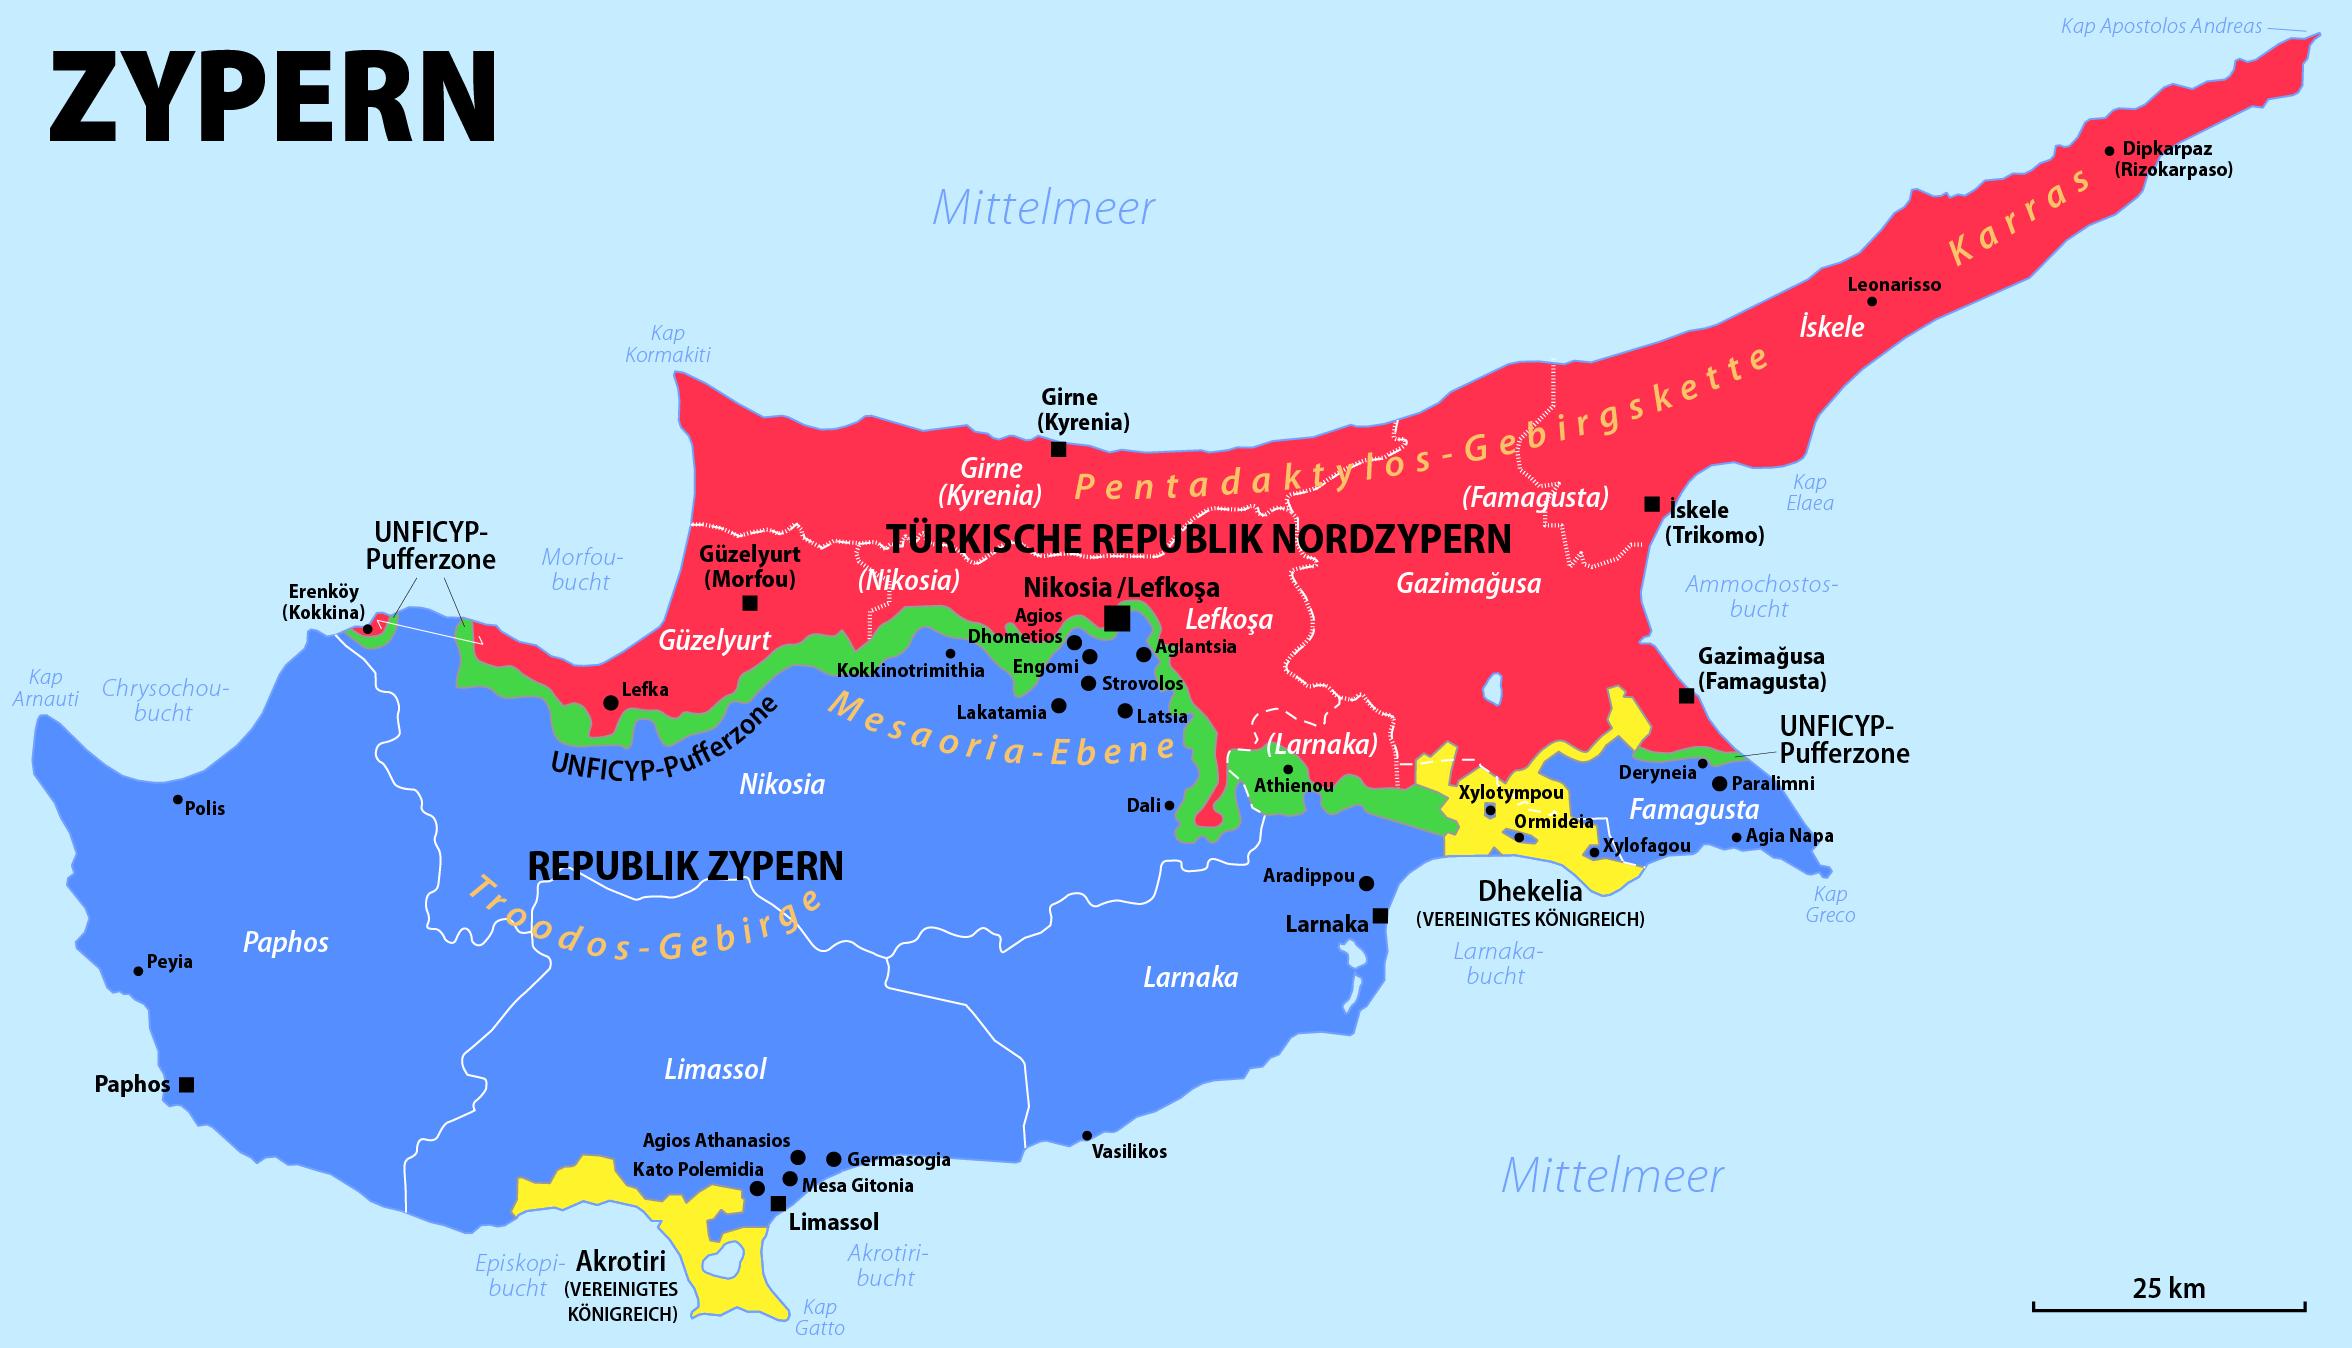 griechenland zypern karte Zypernkonflikt – Wikipedia